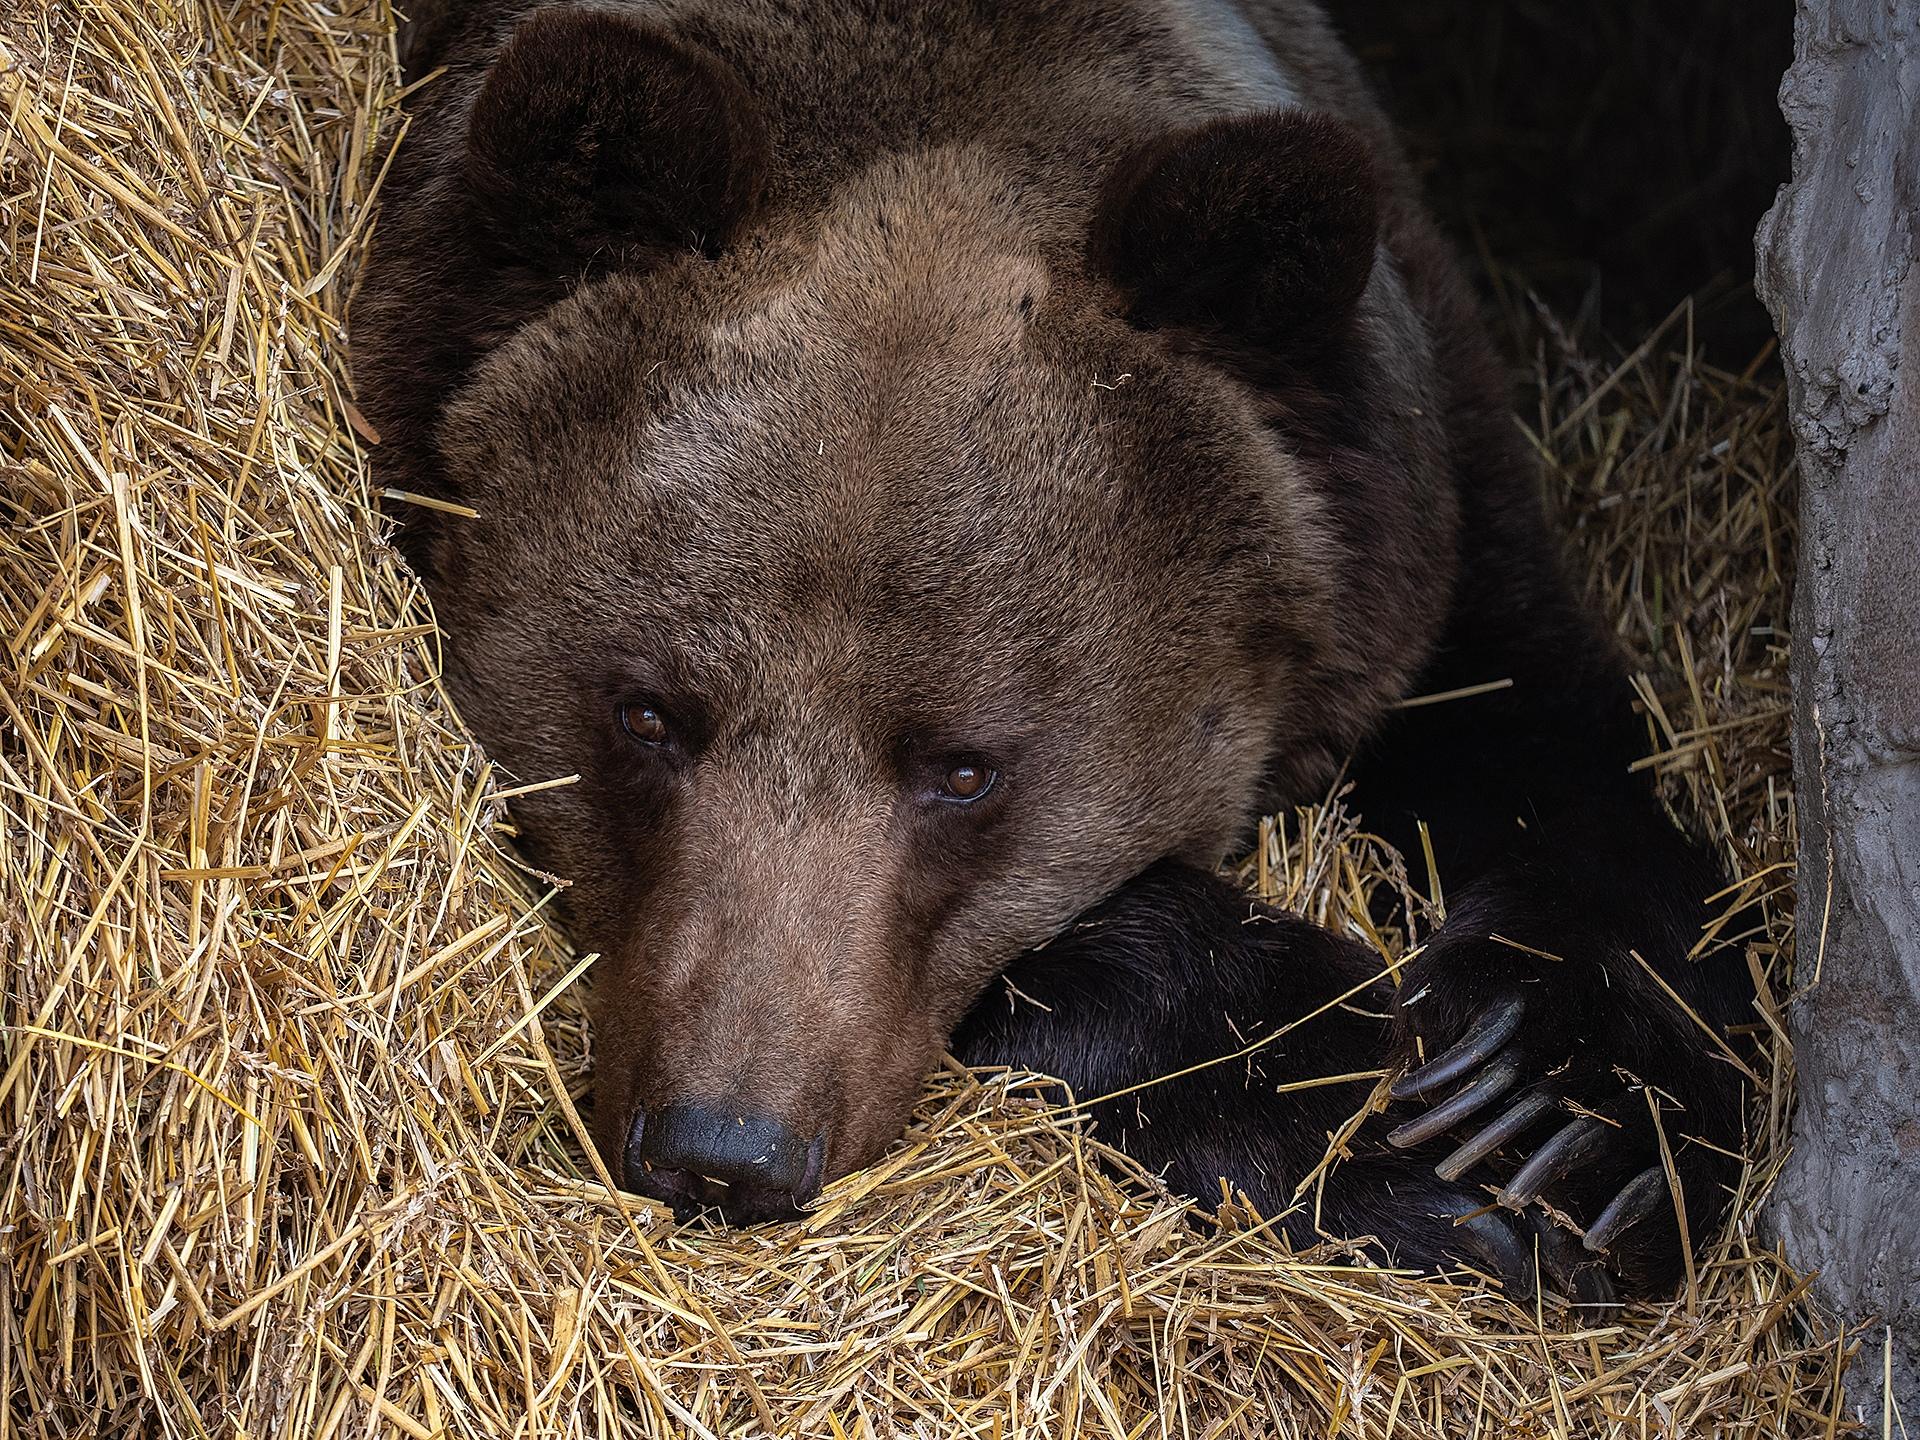 Бурый медведь лег спать